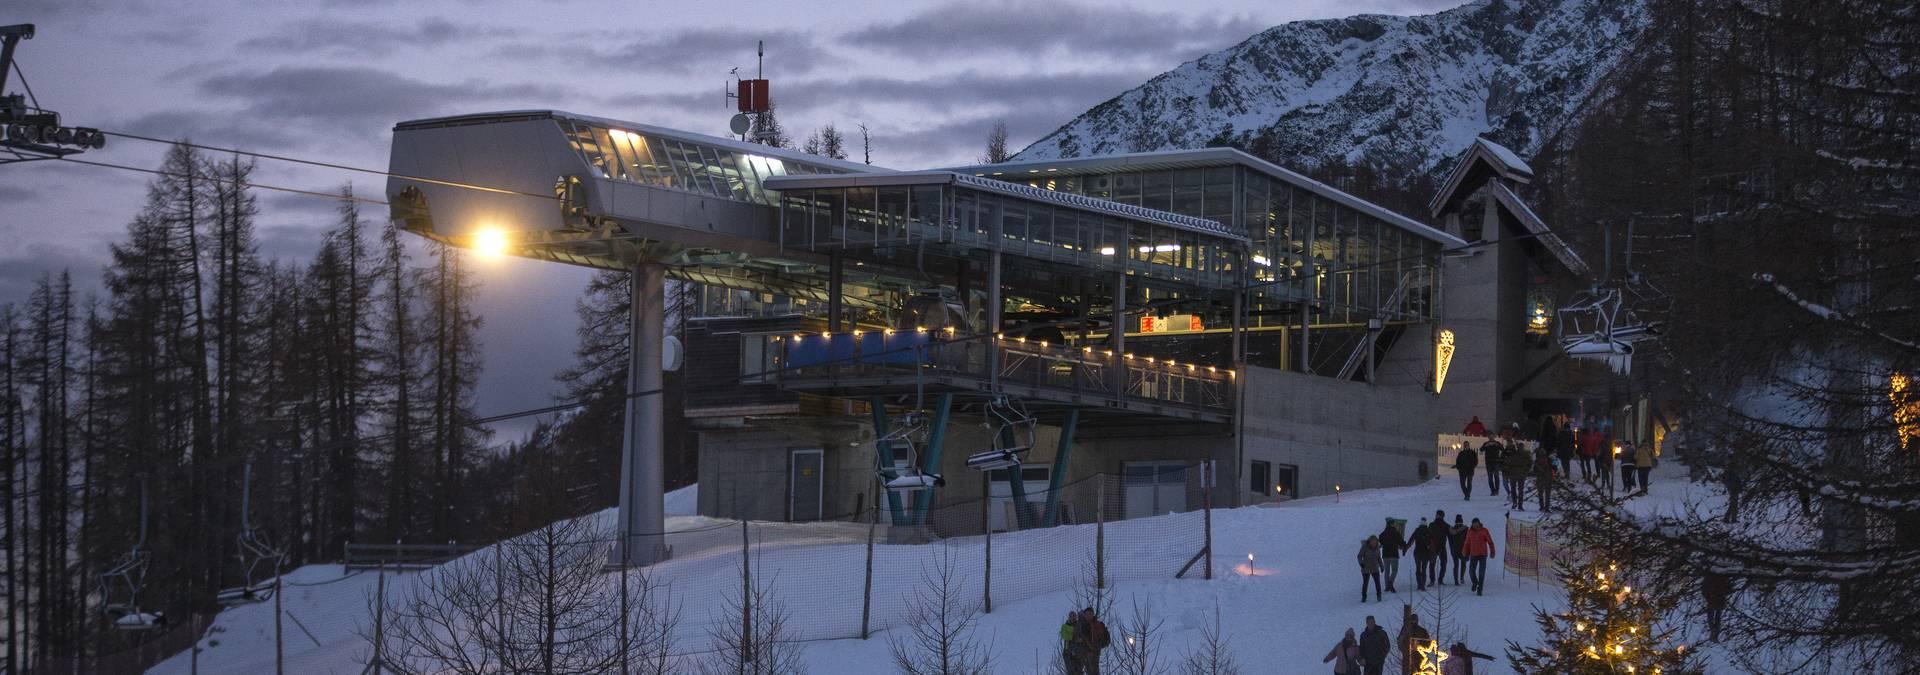 Bergstation Petzen - Adventmarkt